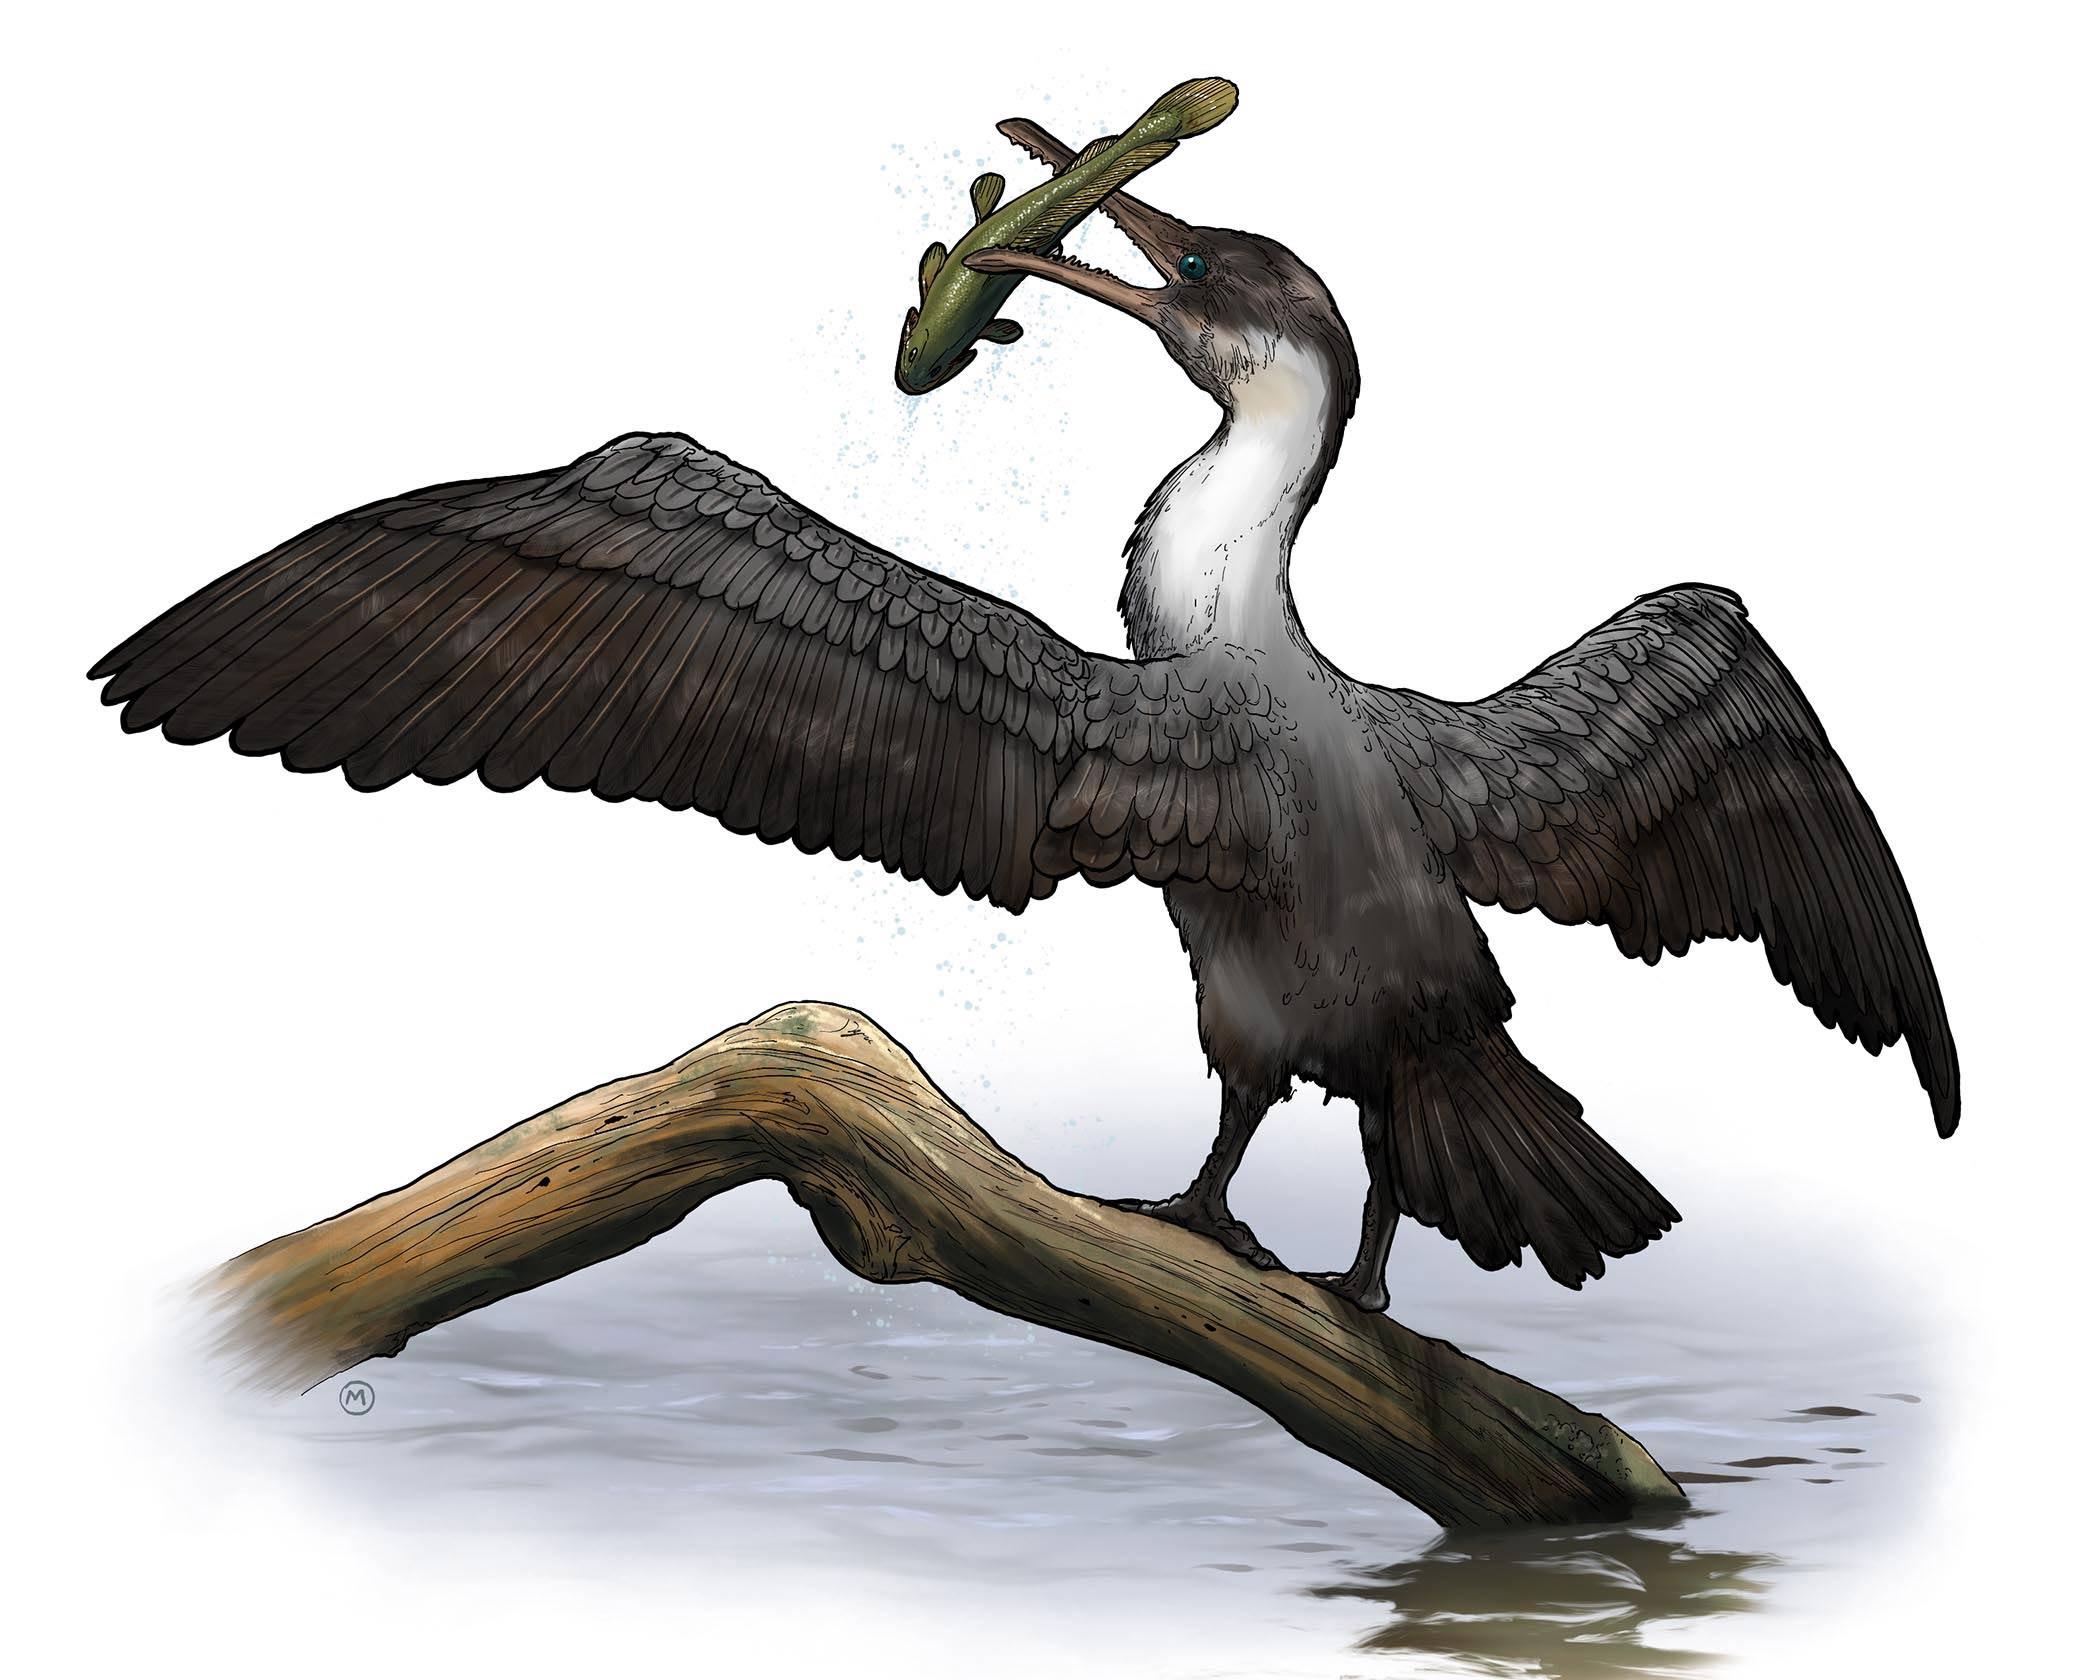 Newly discovered prehistoric bird lived near a balmy North Pole